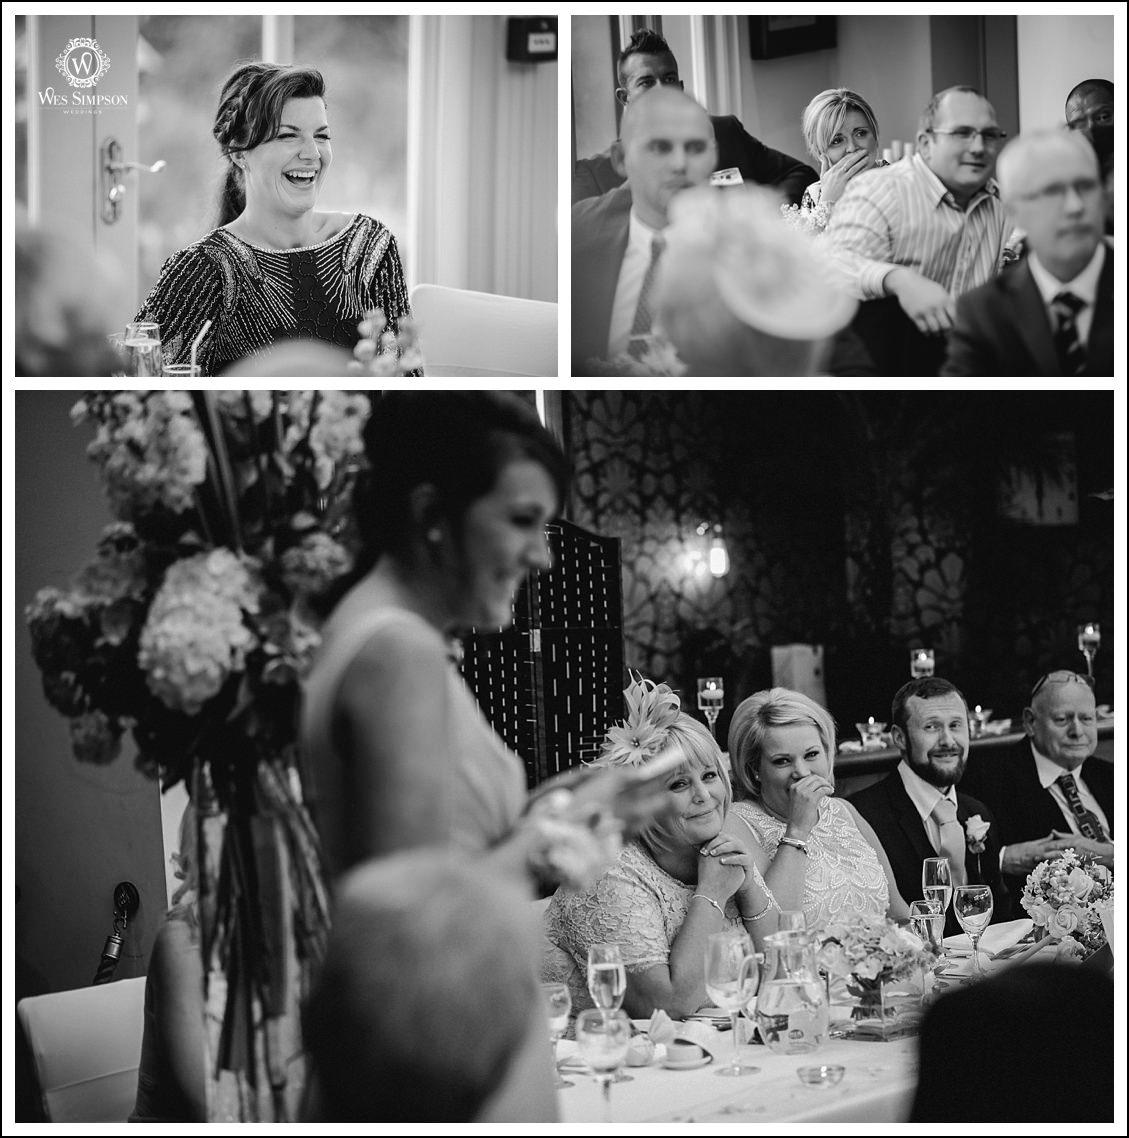 Broadoaks wedding venue, Lake District wedding photographer, Windermere, Wes Simpson photography_0069